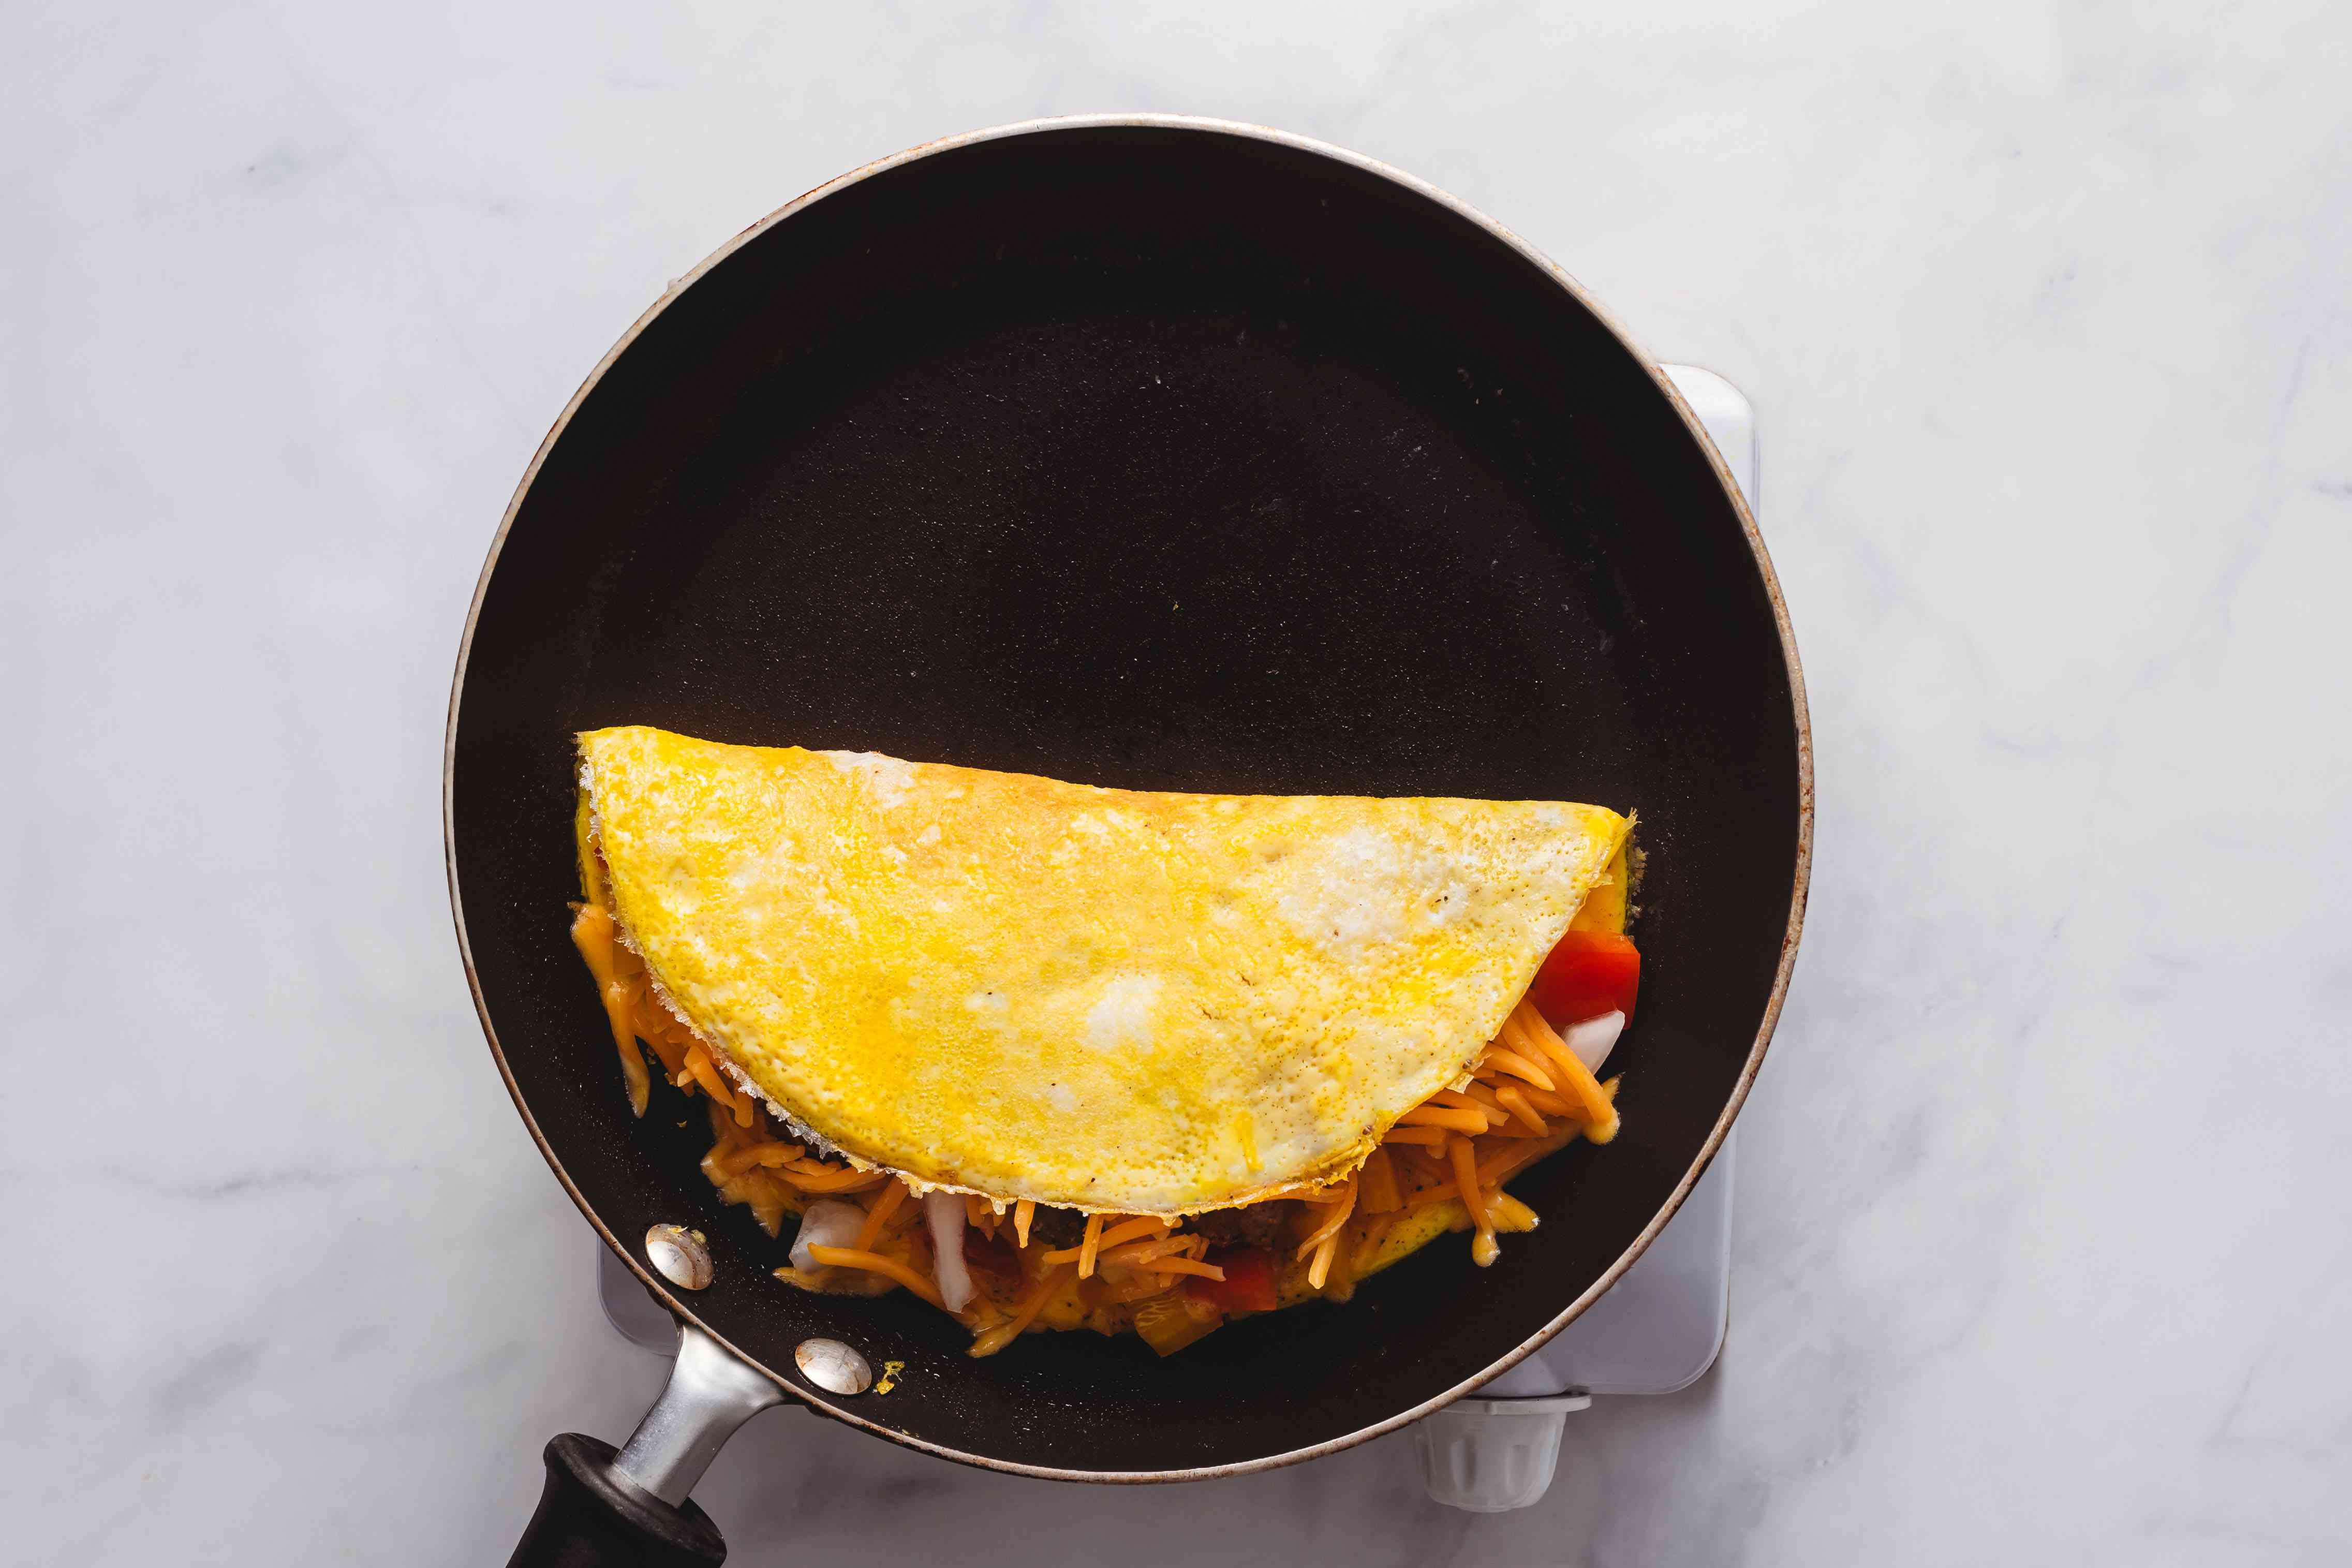 omelet folded over the filling in the skillet